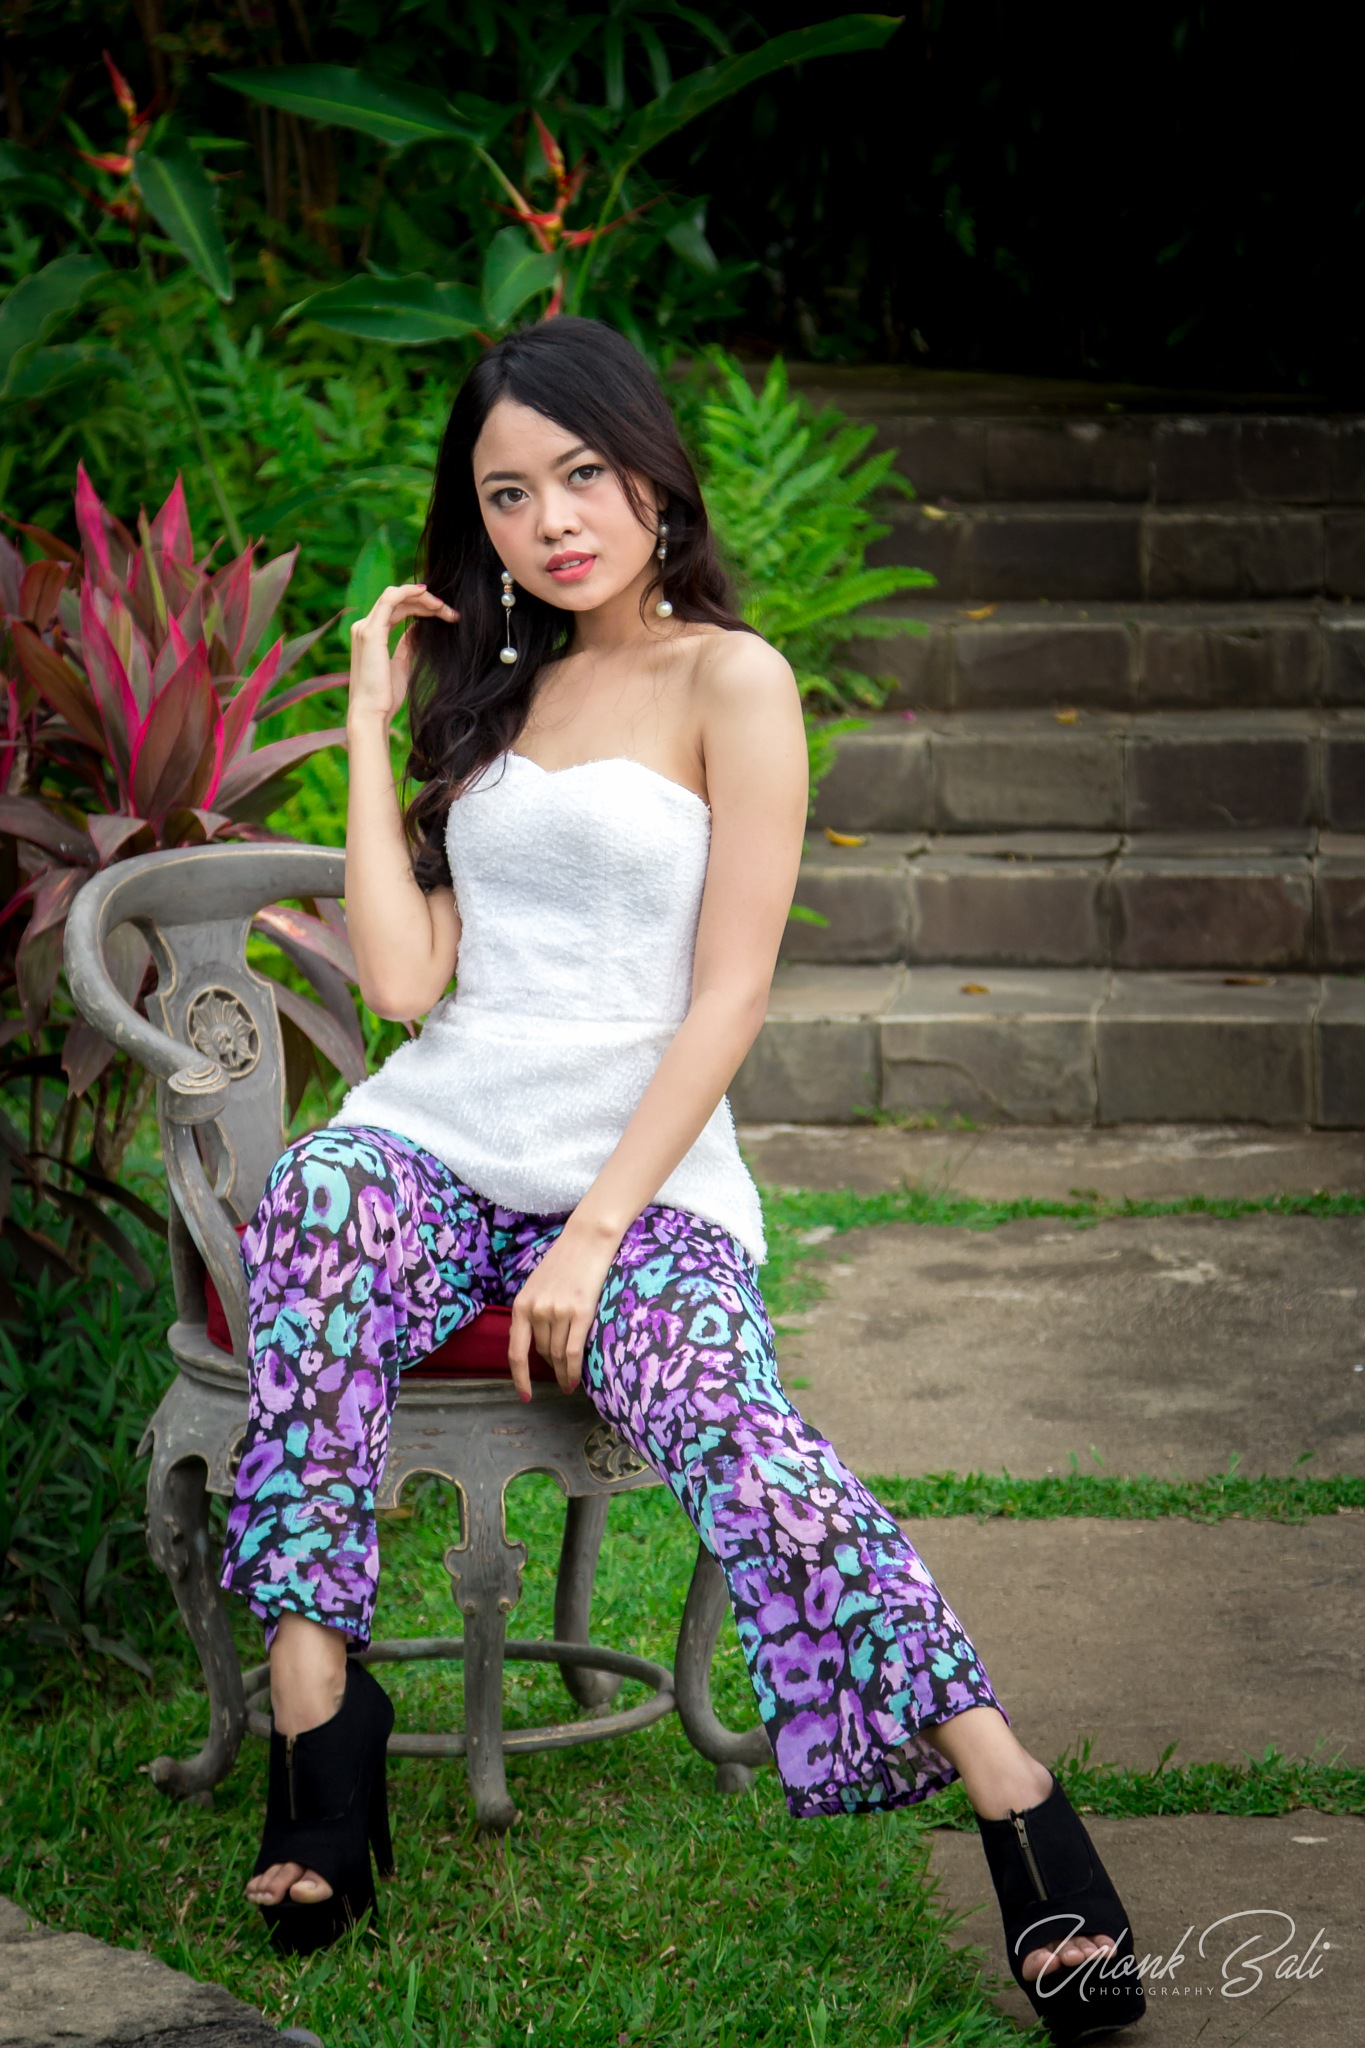 Bali best academy by Ulonk Bali Photography